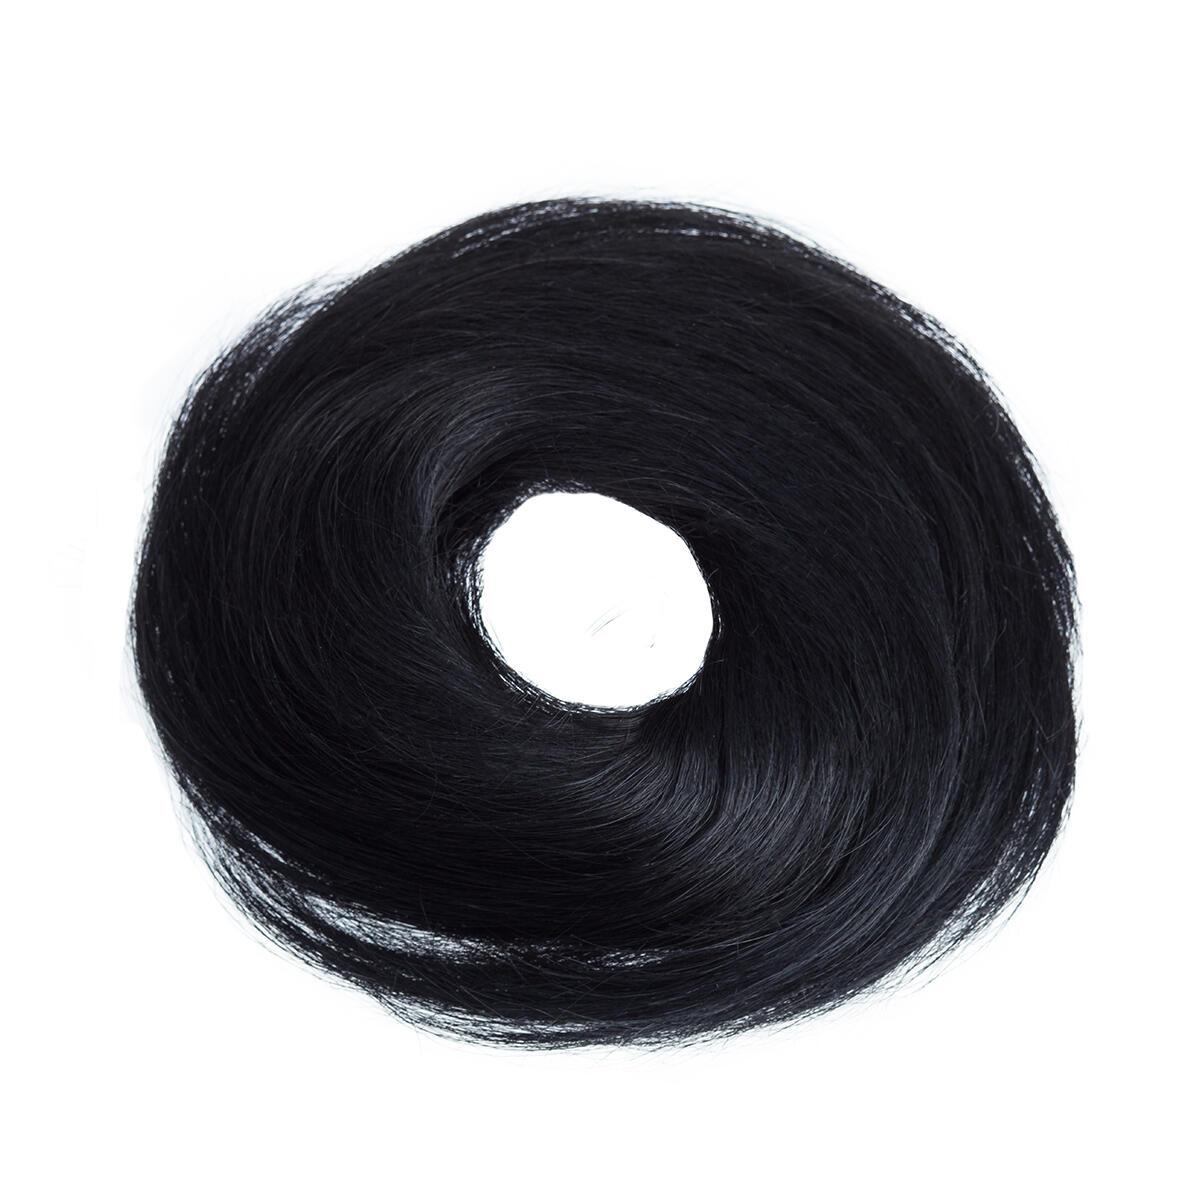 Volume Hair Scrunchie Original 40 g 1.0 Black 0 cm